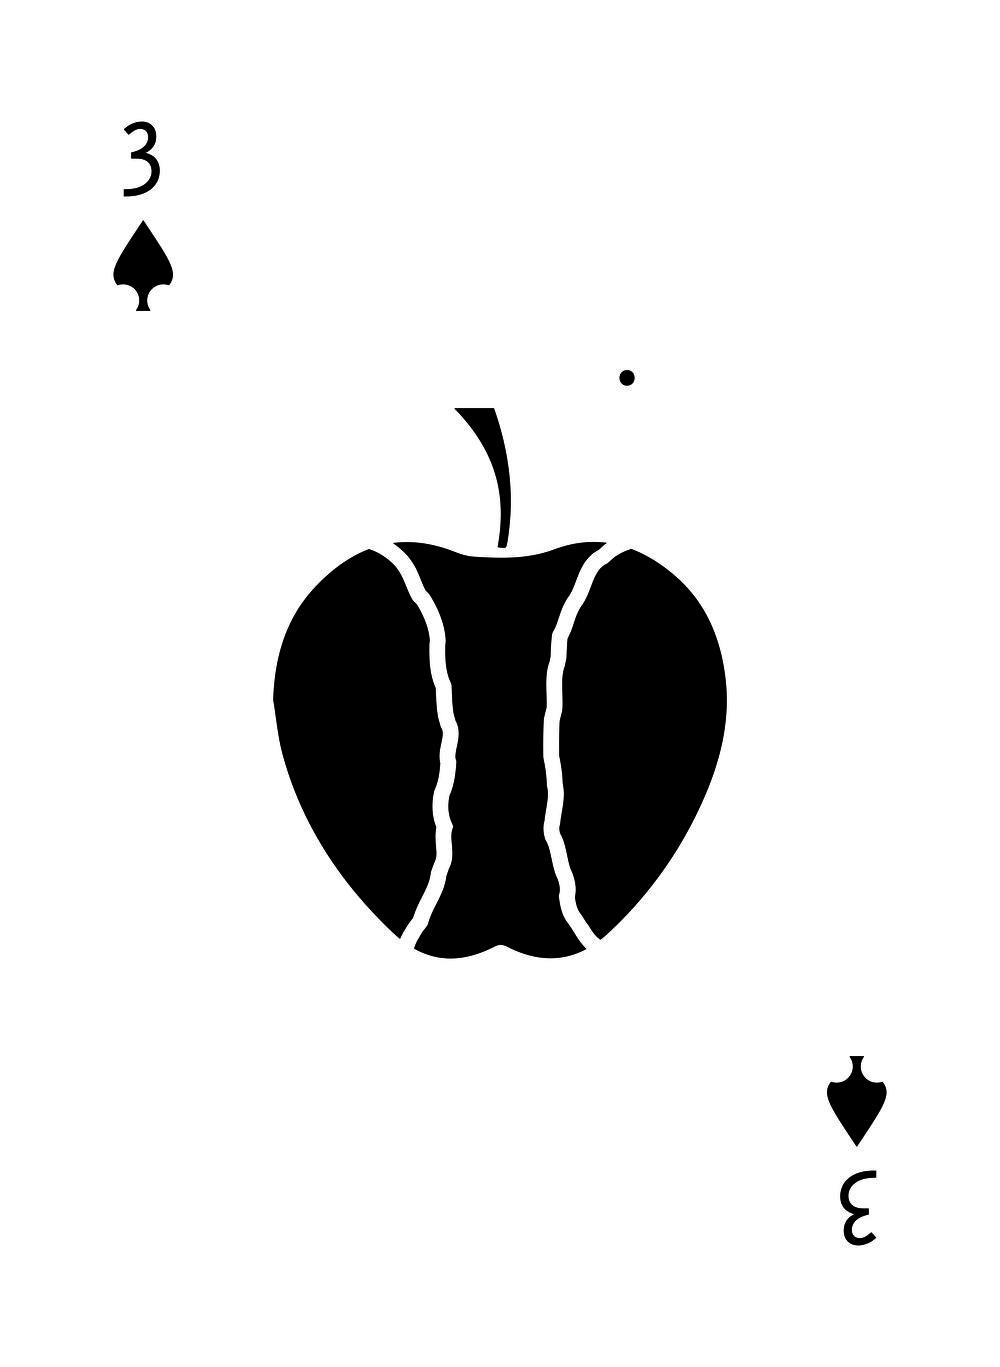 52_2__0010_Spades_3.jpg